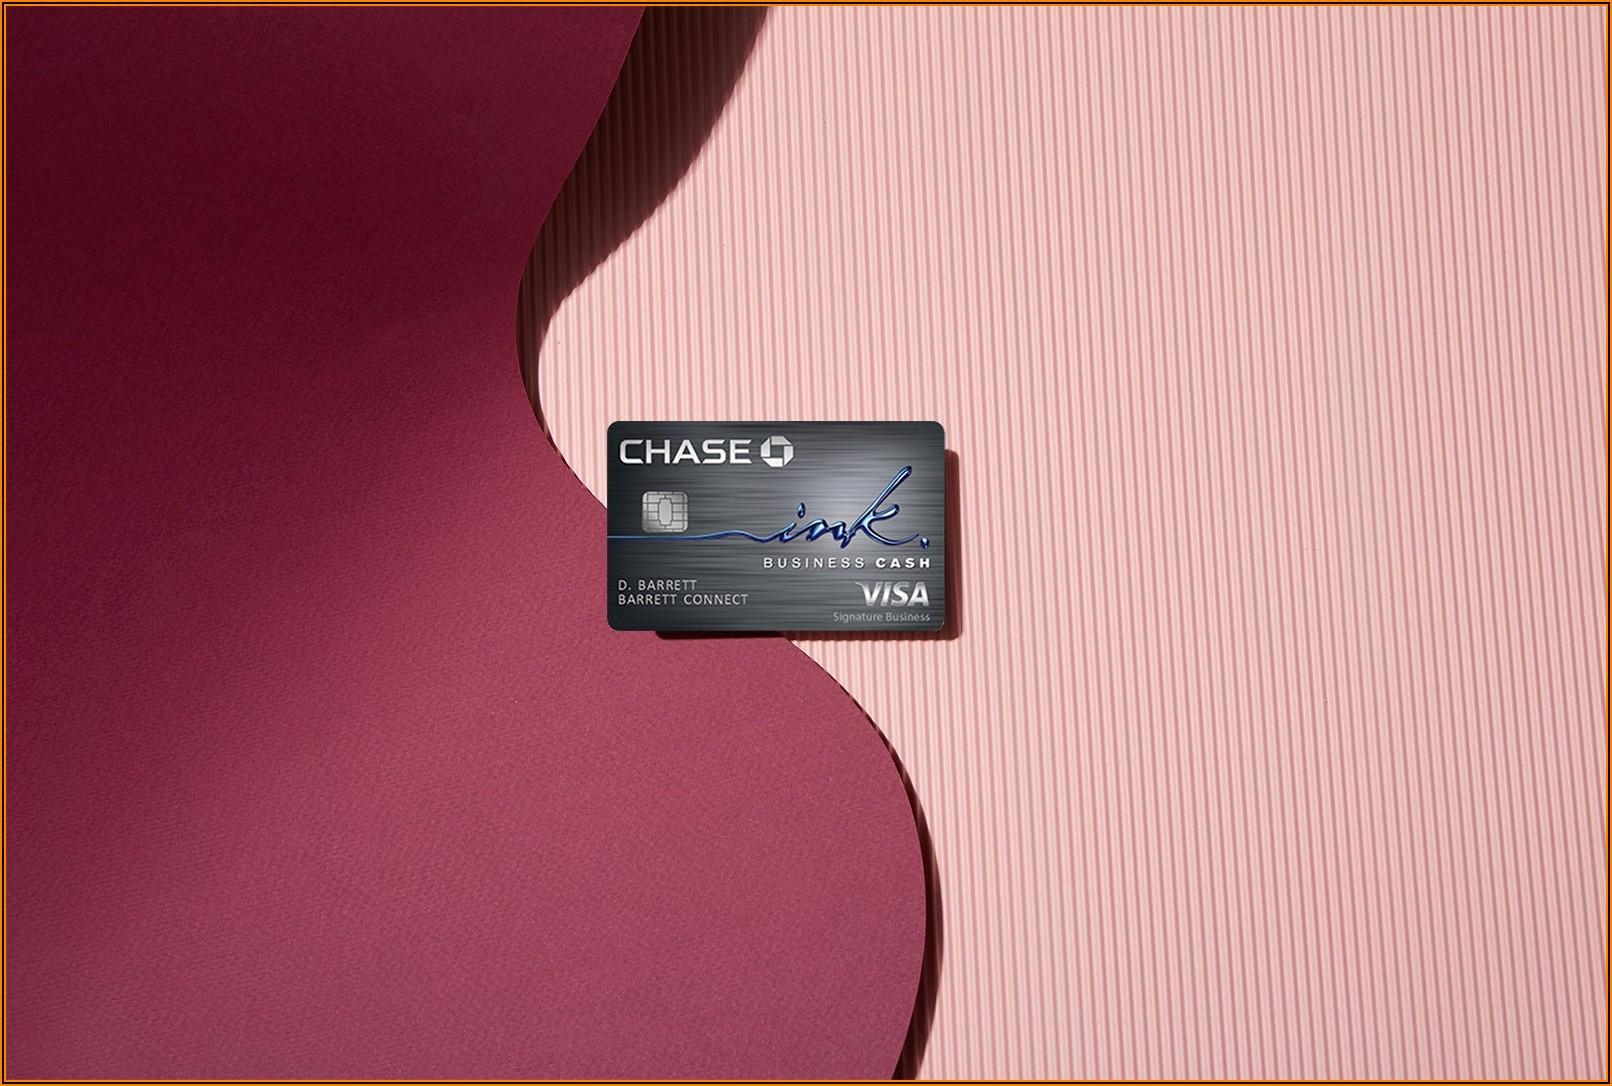 Best Business Cash Rewards Card